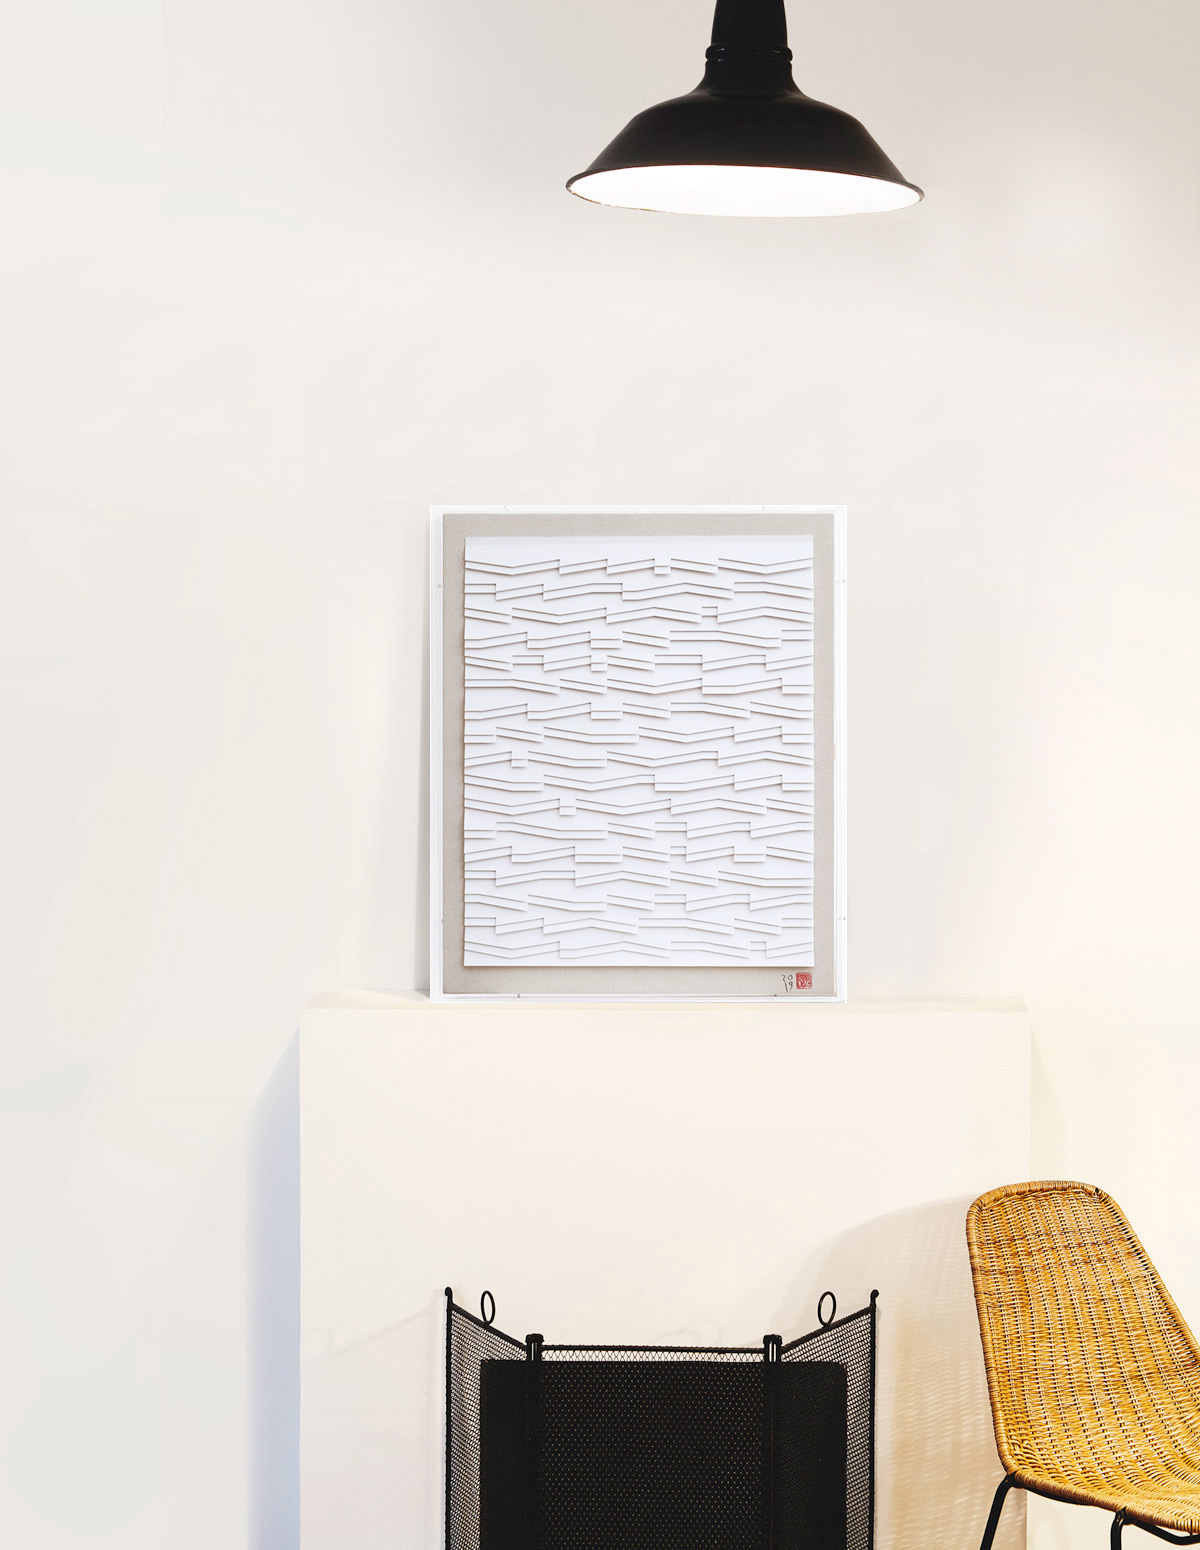 Fernando Daza - Oeuvre sur papier - Monochrome basik 2